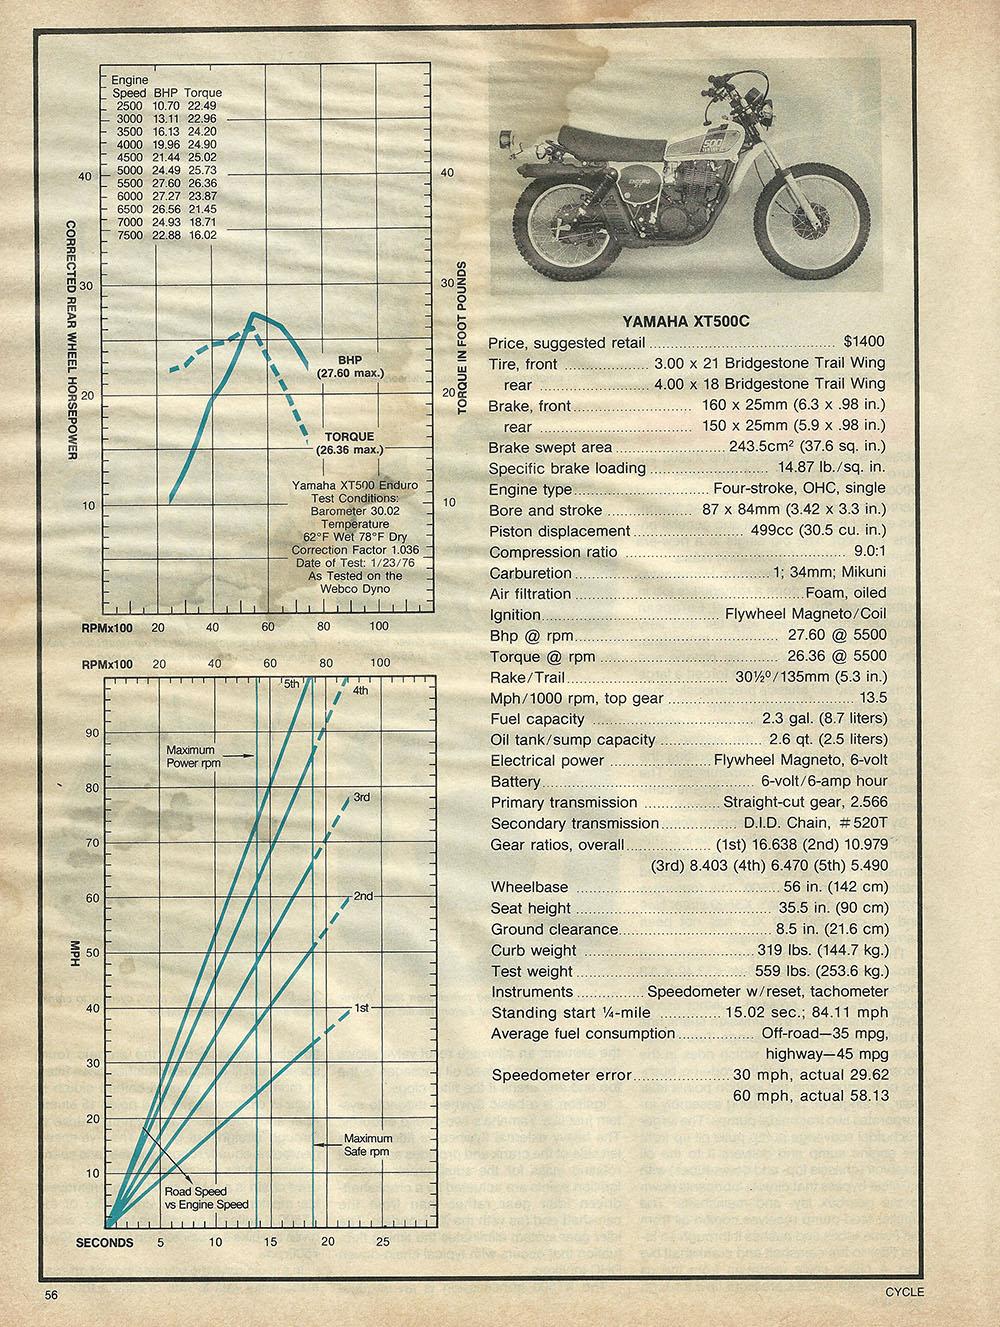 1976 Yamaha XT500C off road test 4.JPG